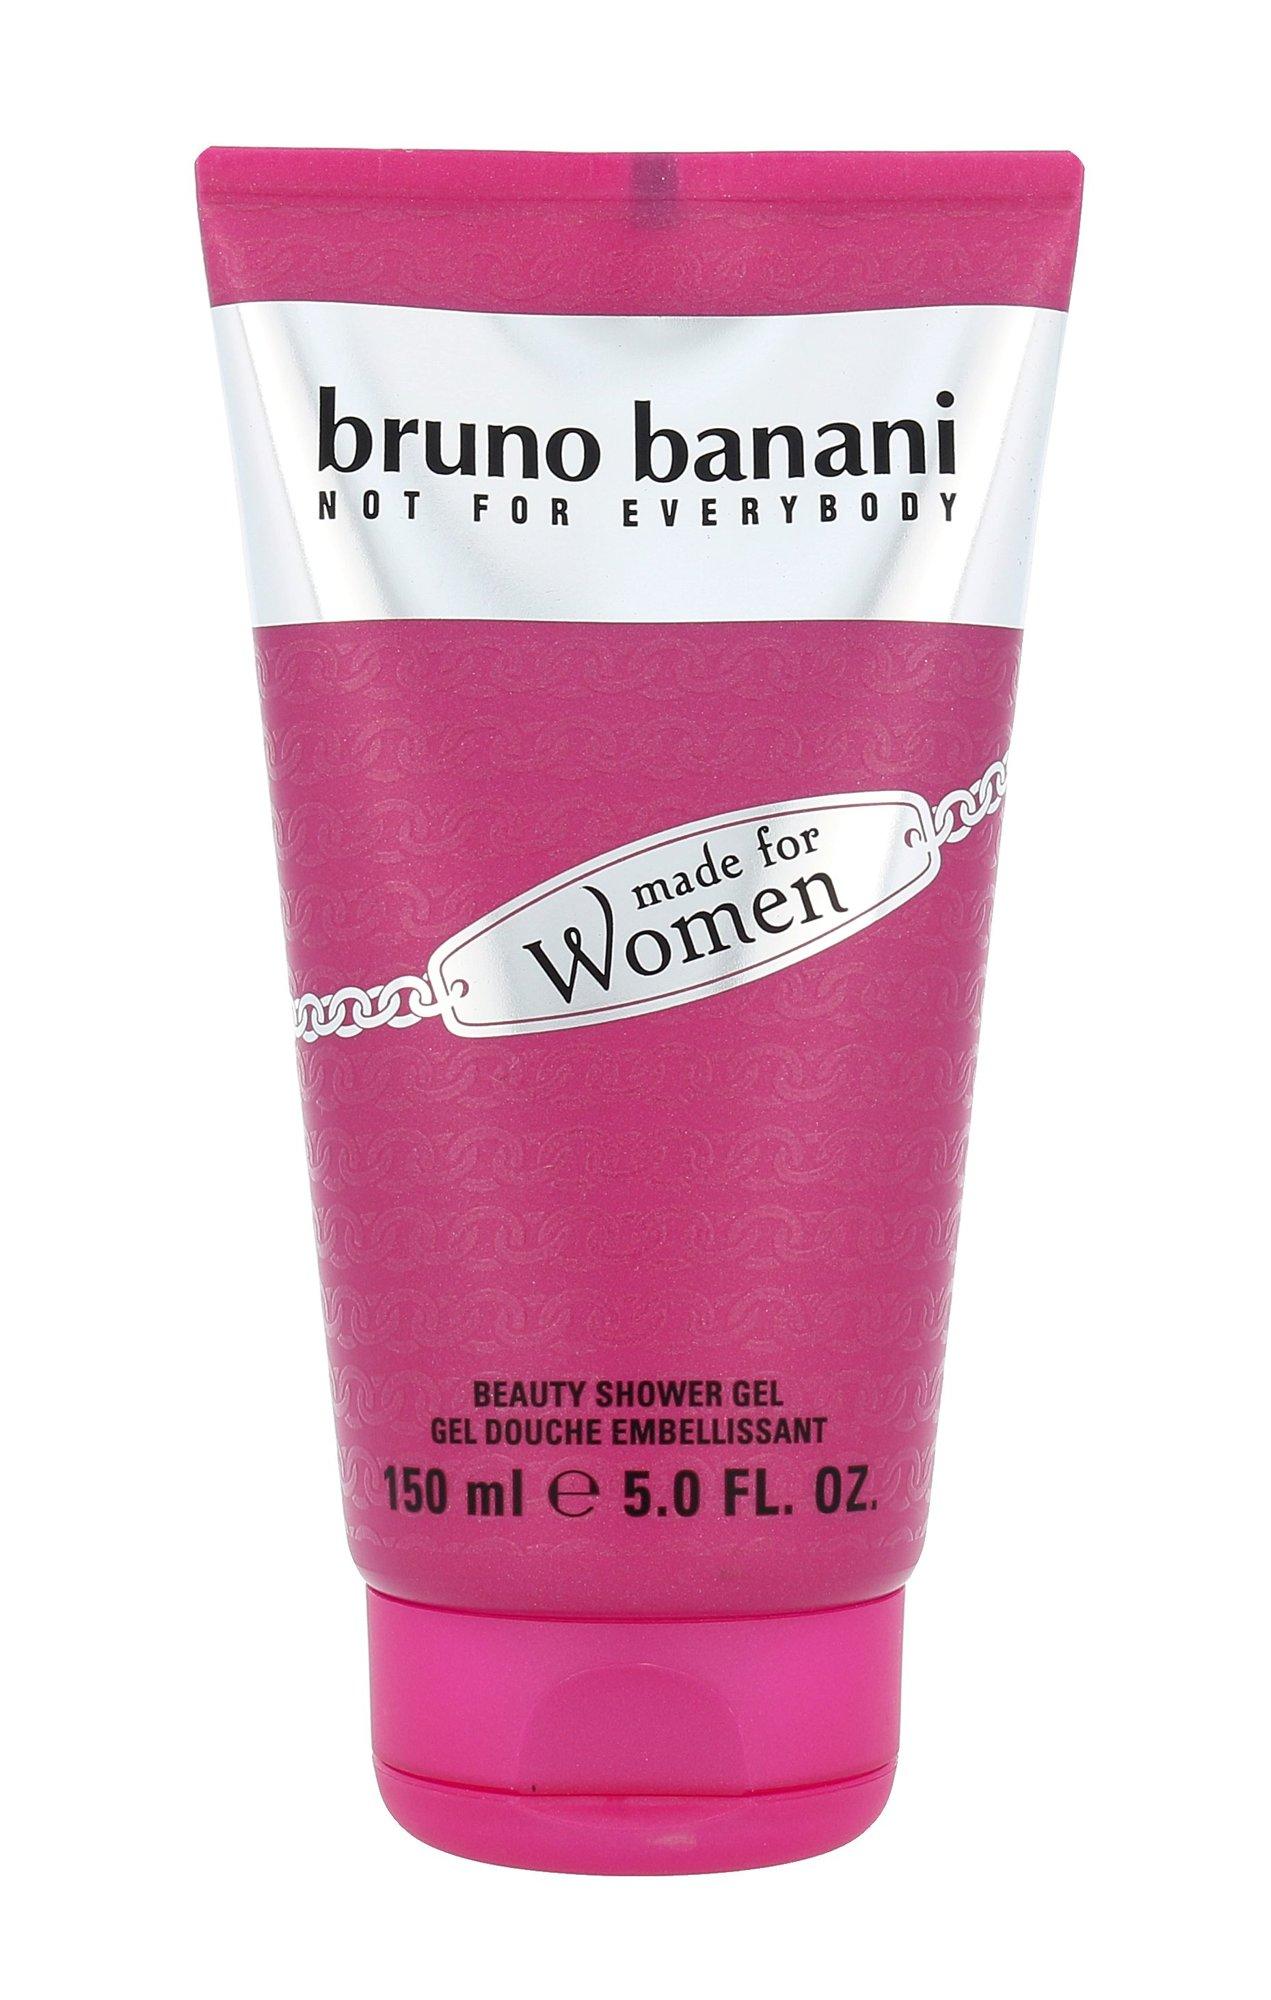 Bruno Banani Made For Women Shower gel 150ml